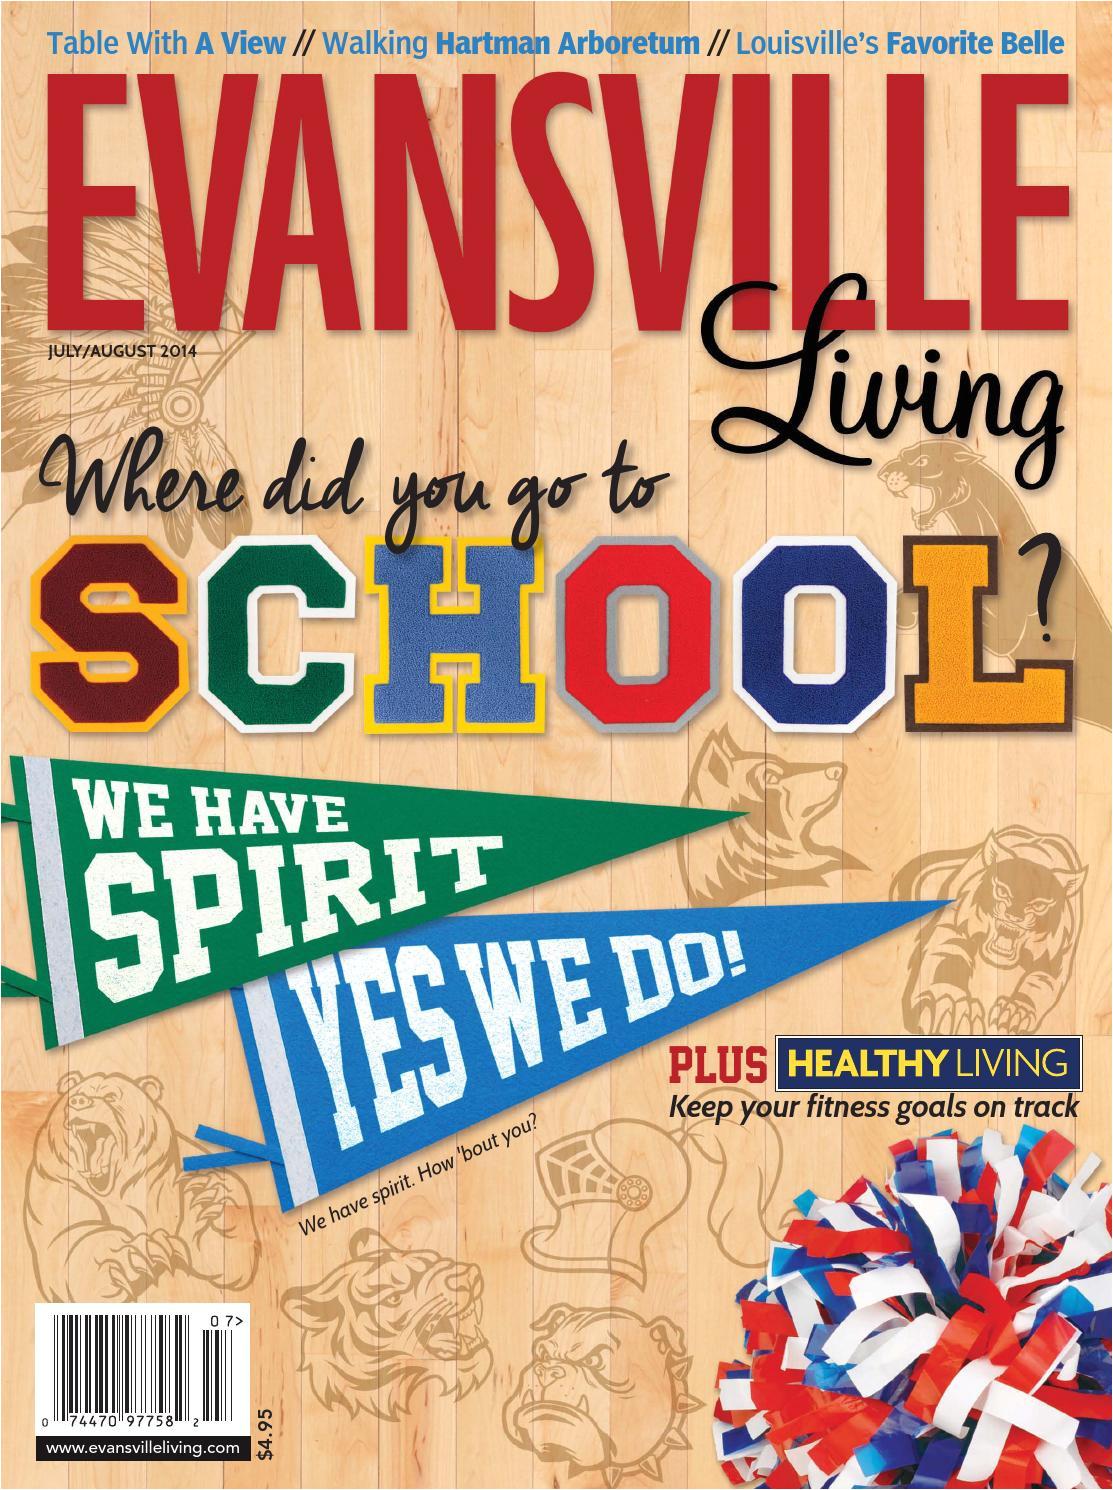 evansville living july august 2014 by evansville living magazine issuu